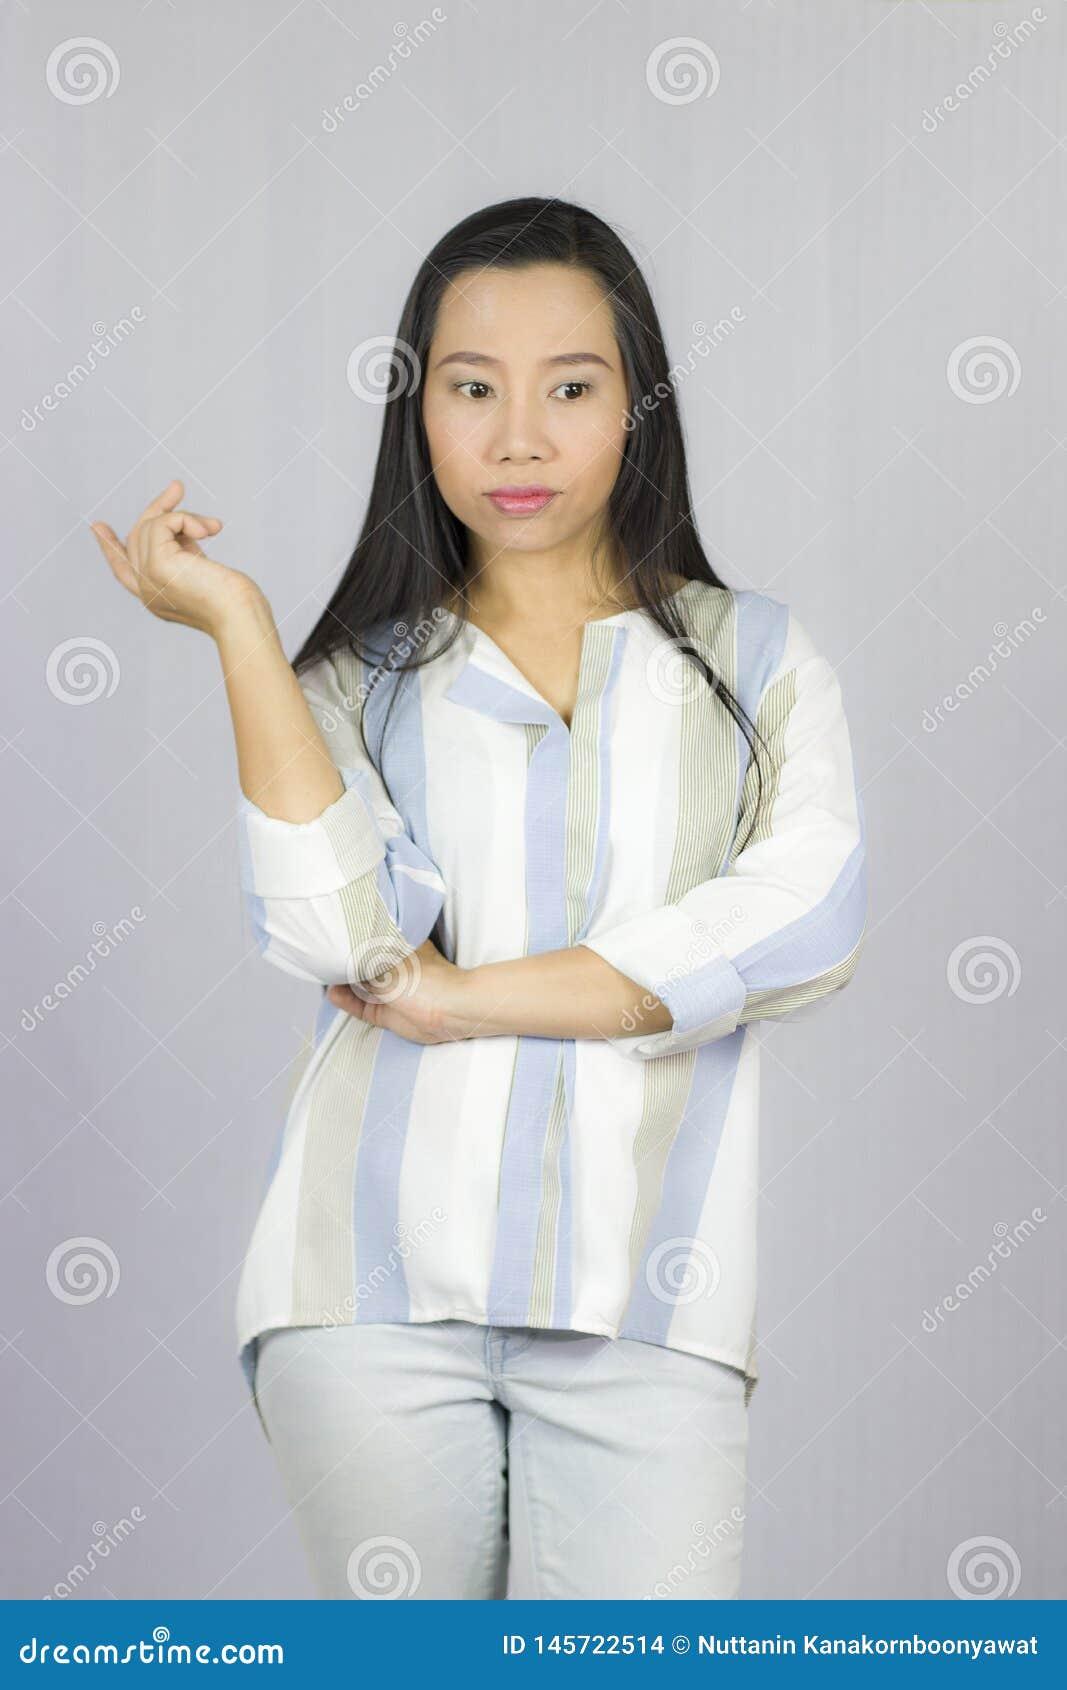 Onderneemster die overhemds stellende glimlach draagt denkt die die op grijze achtergrond wordt ge?soleerd